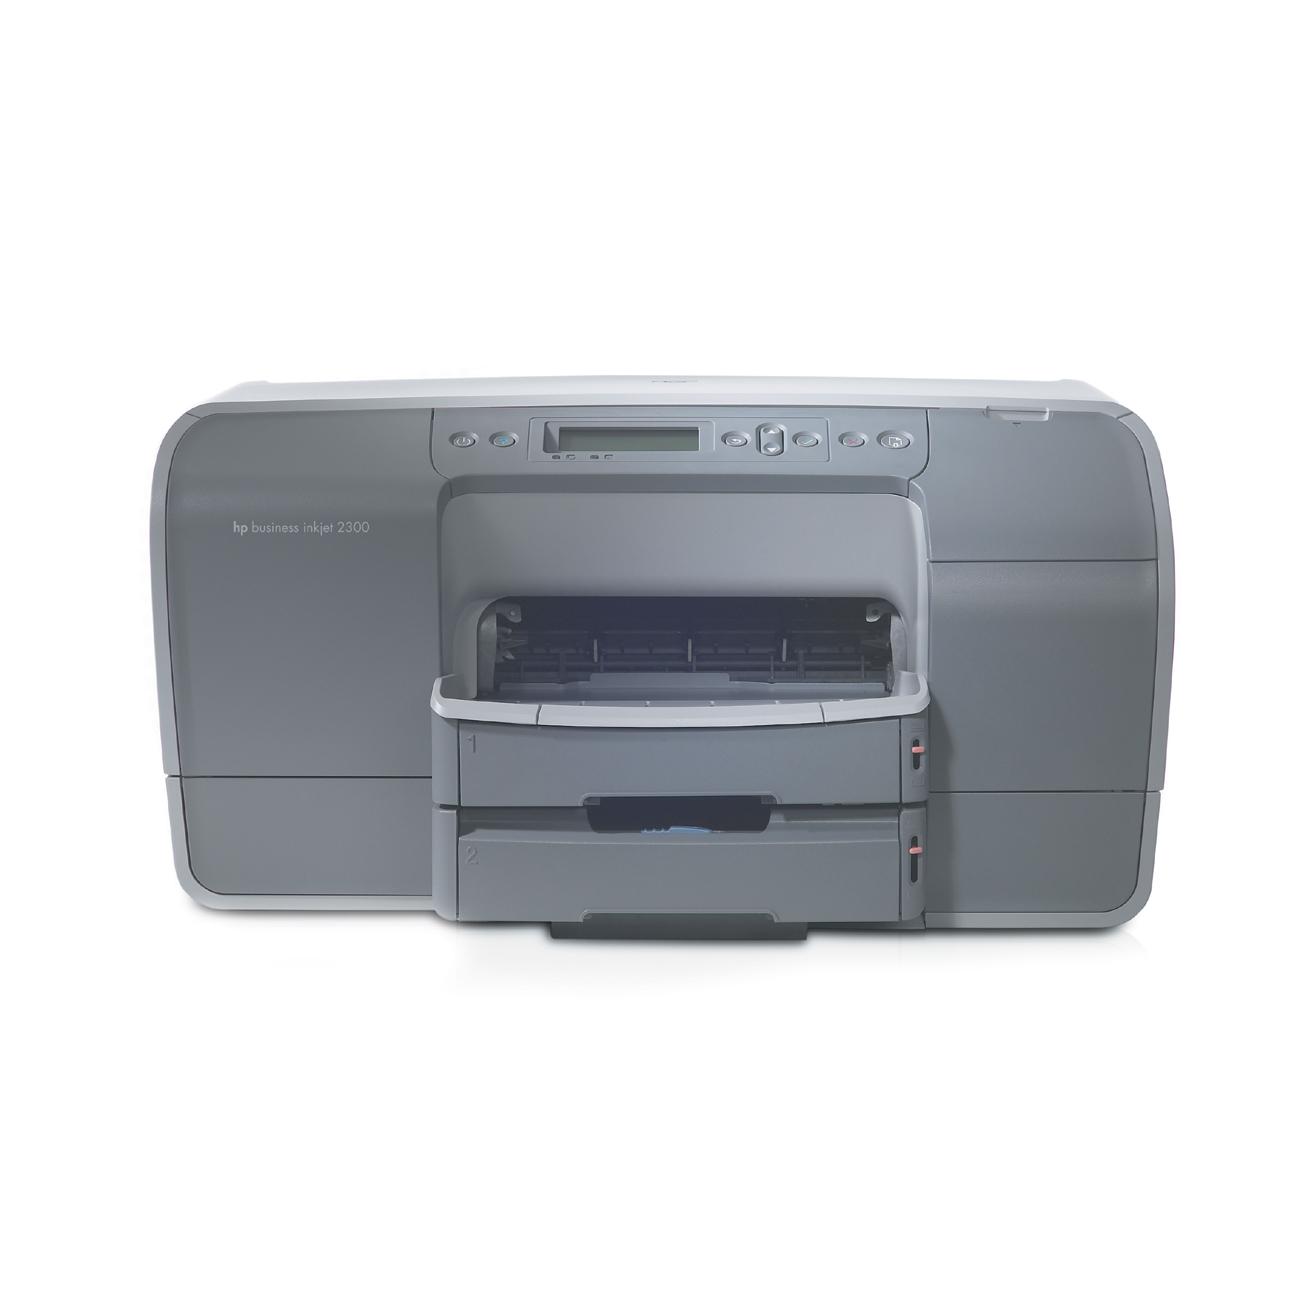 superwarehouse hp business inkjet 2300 hp c8125a a2l rh superwarehouse com HP Photosmart HP Inkjet 1200N